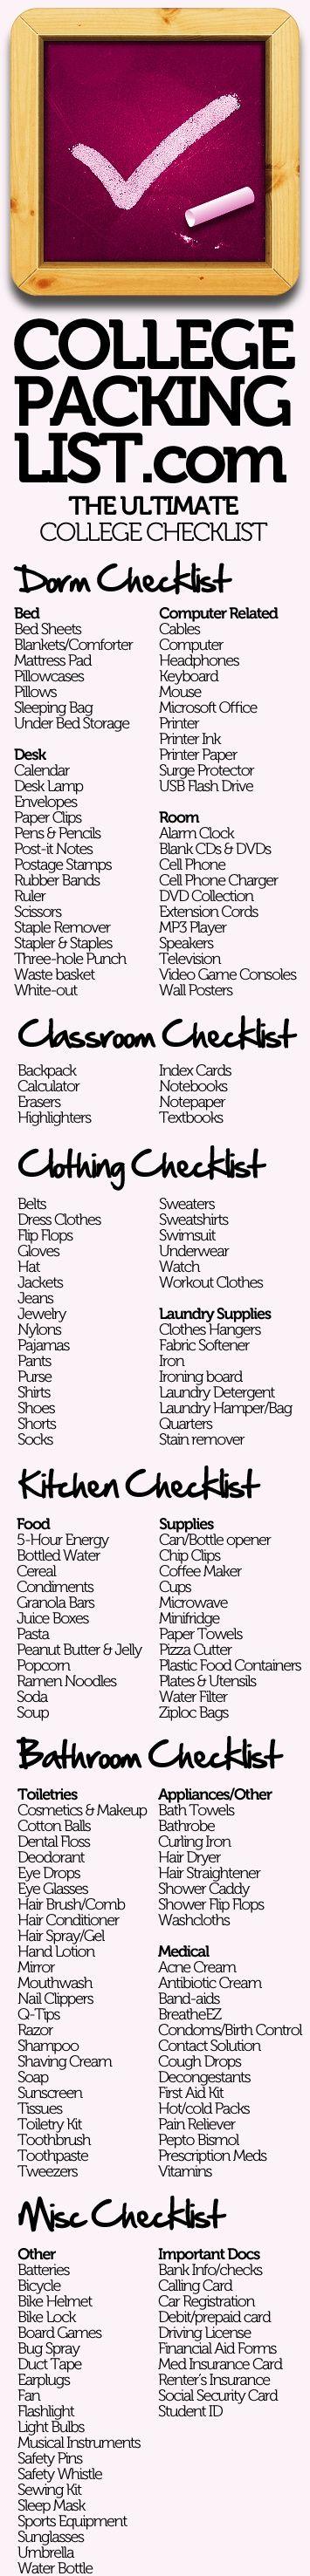 college checklist college checklist college checklist